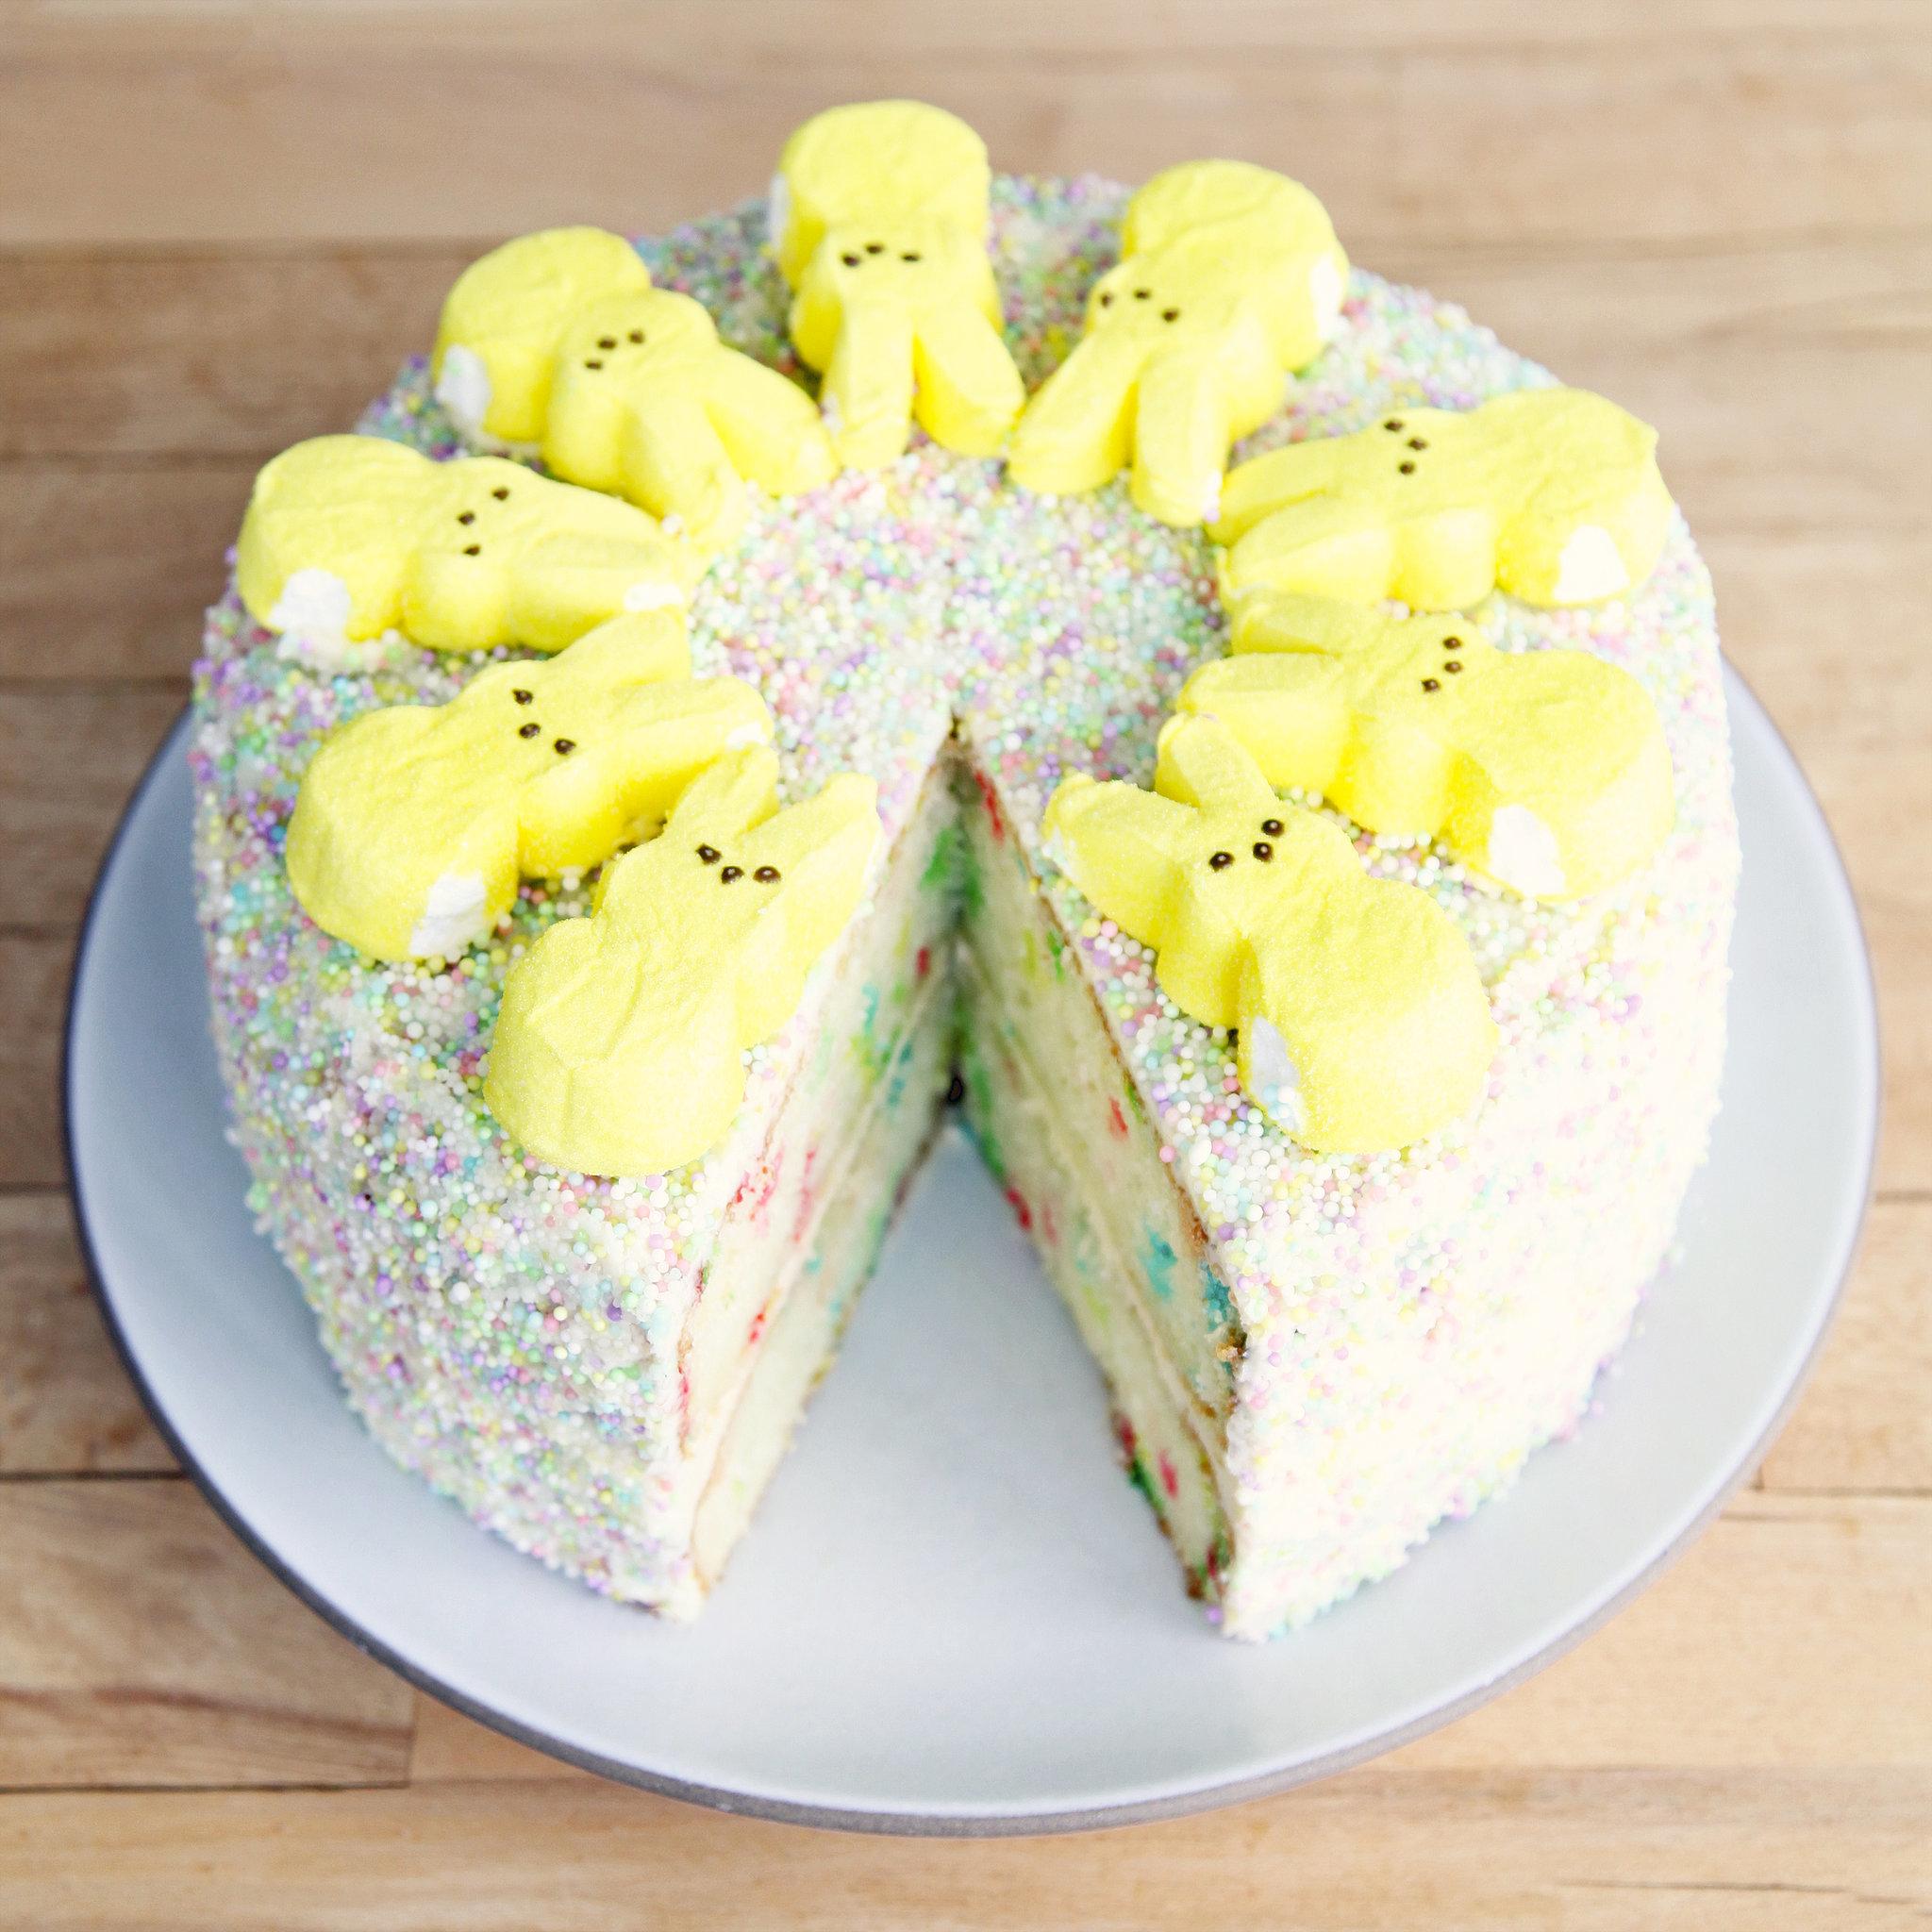 Funfetti Peeps Cake | Creative Easter Peeps Cake Ideas | Homemade Recipes